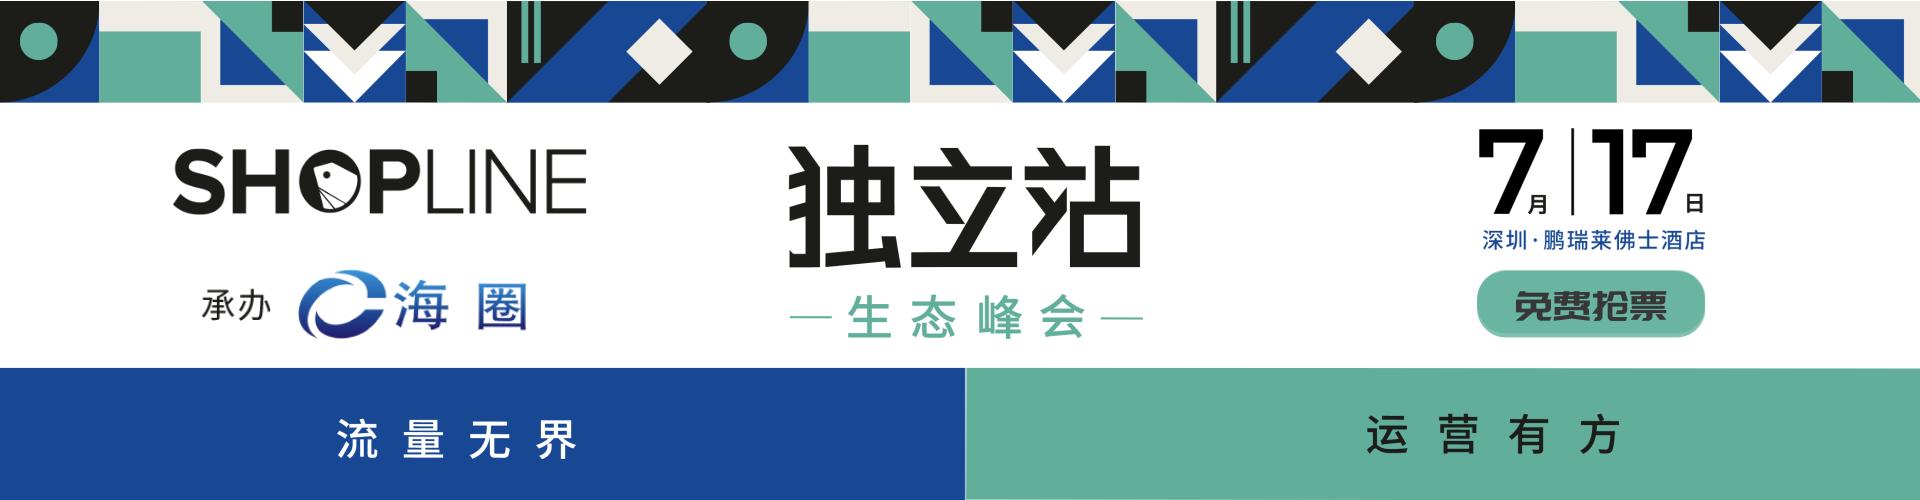 2020 SHOPLINE 独立站生态峰会